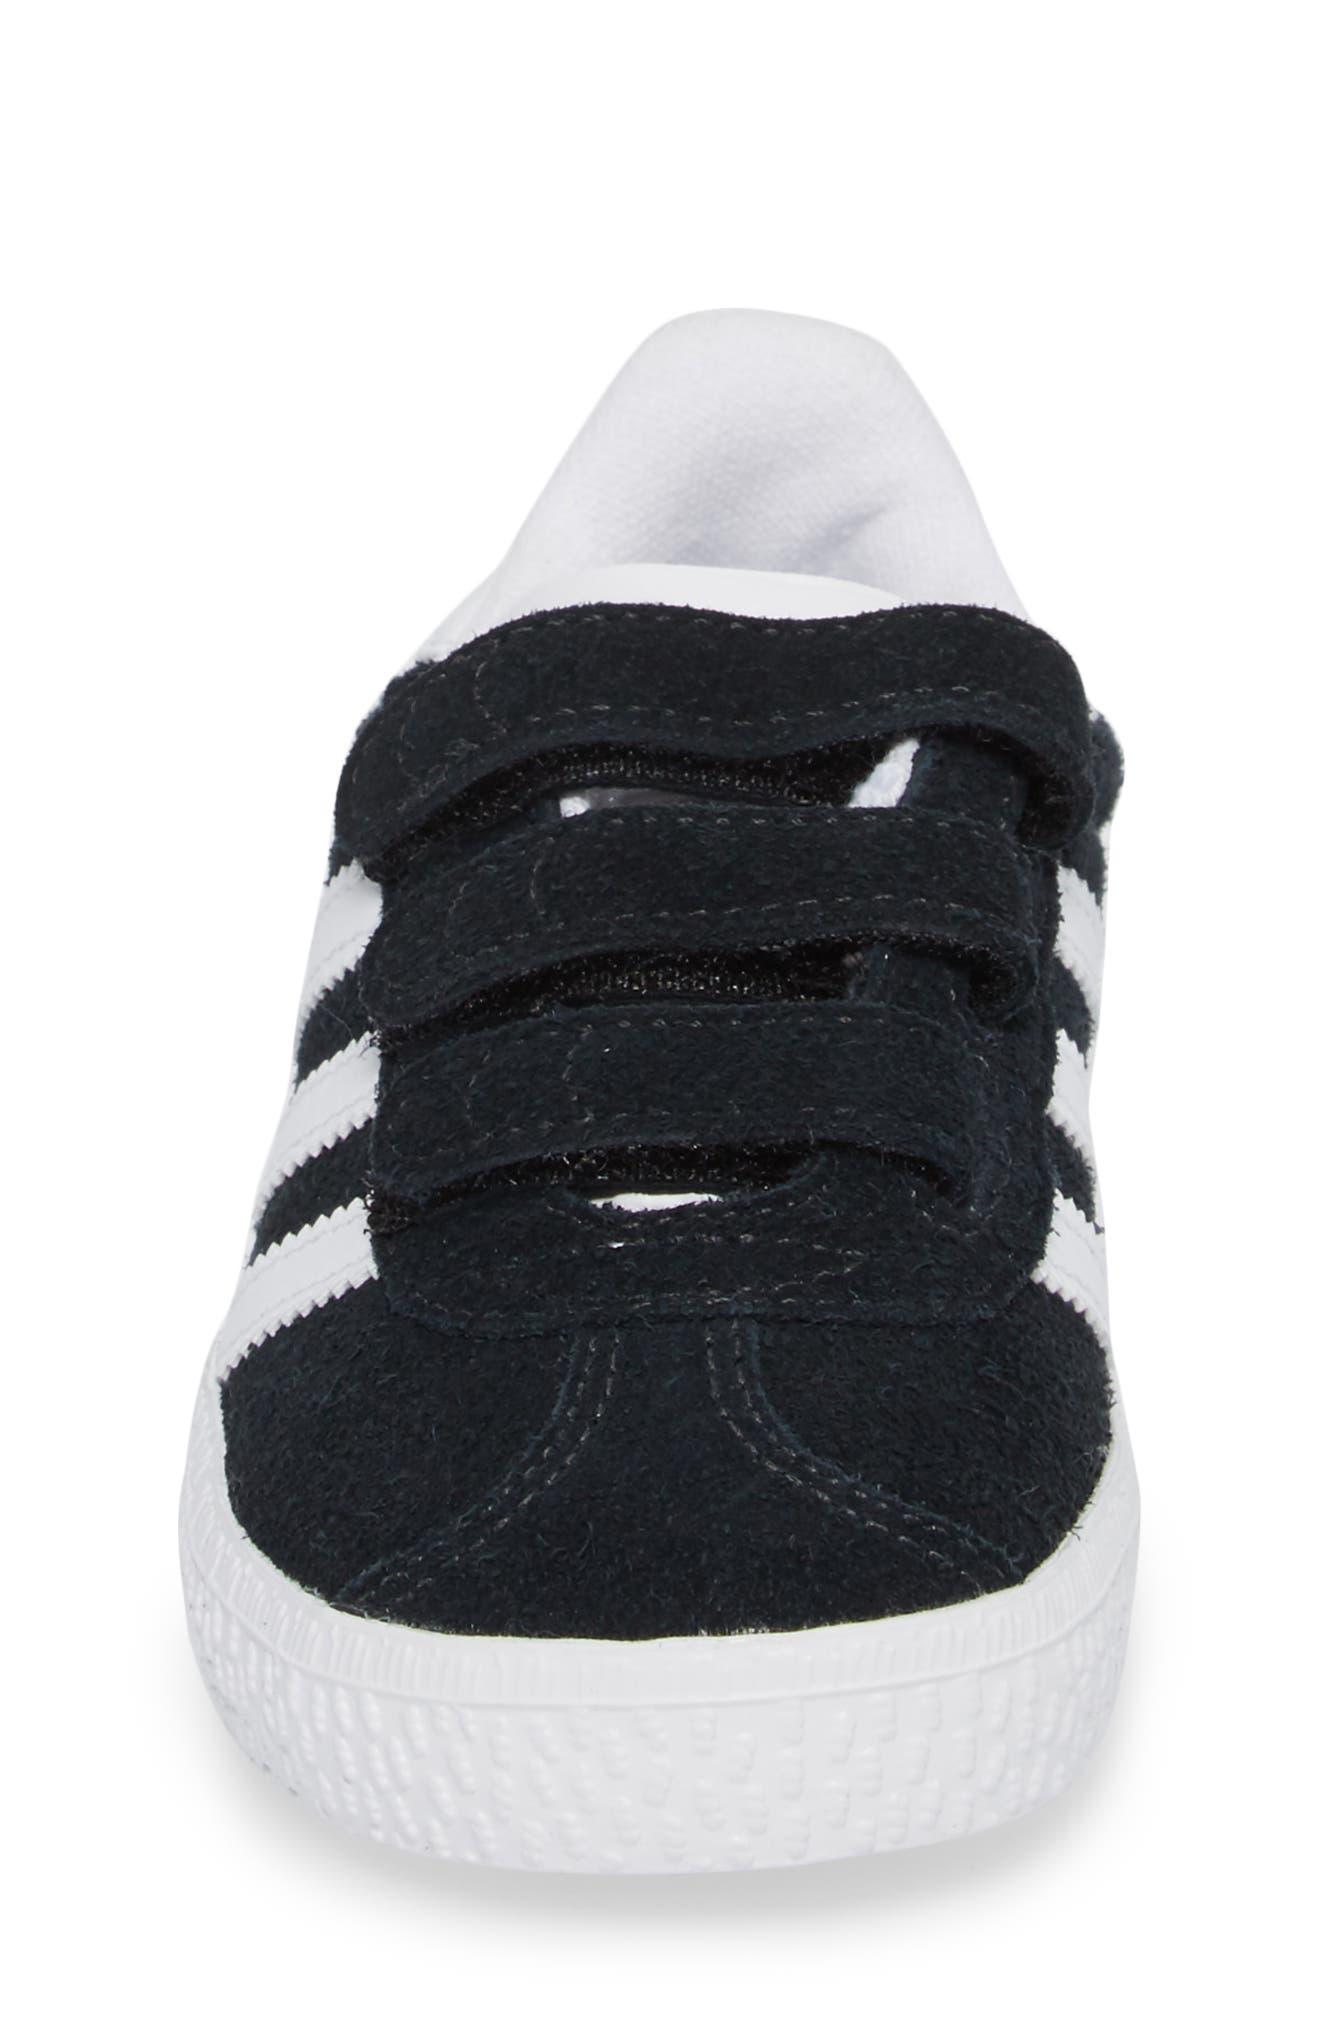 Gazelle Sneaker,                             Alternate thumbnail 5, color,                             Core Black / White / White